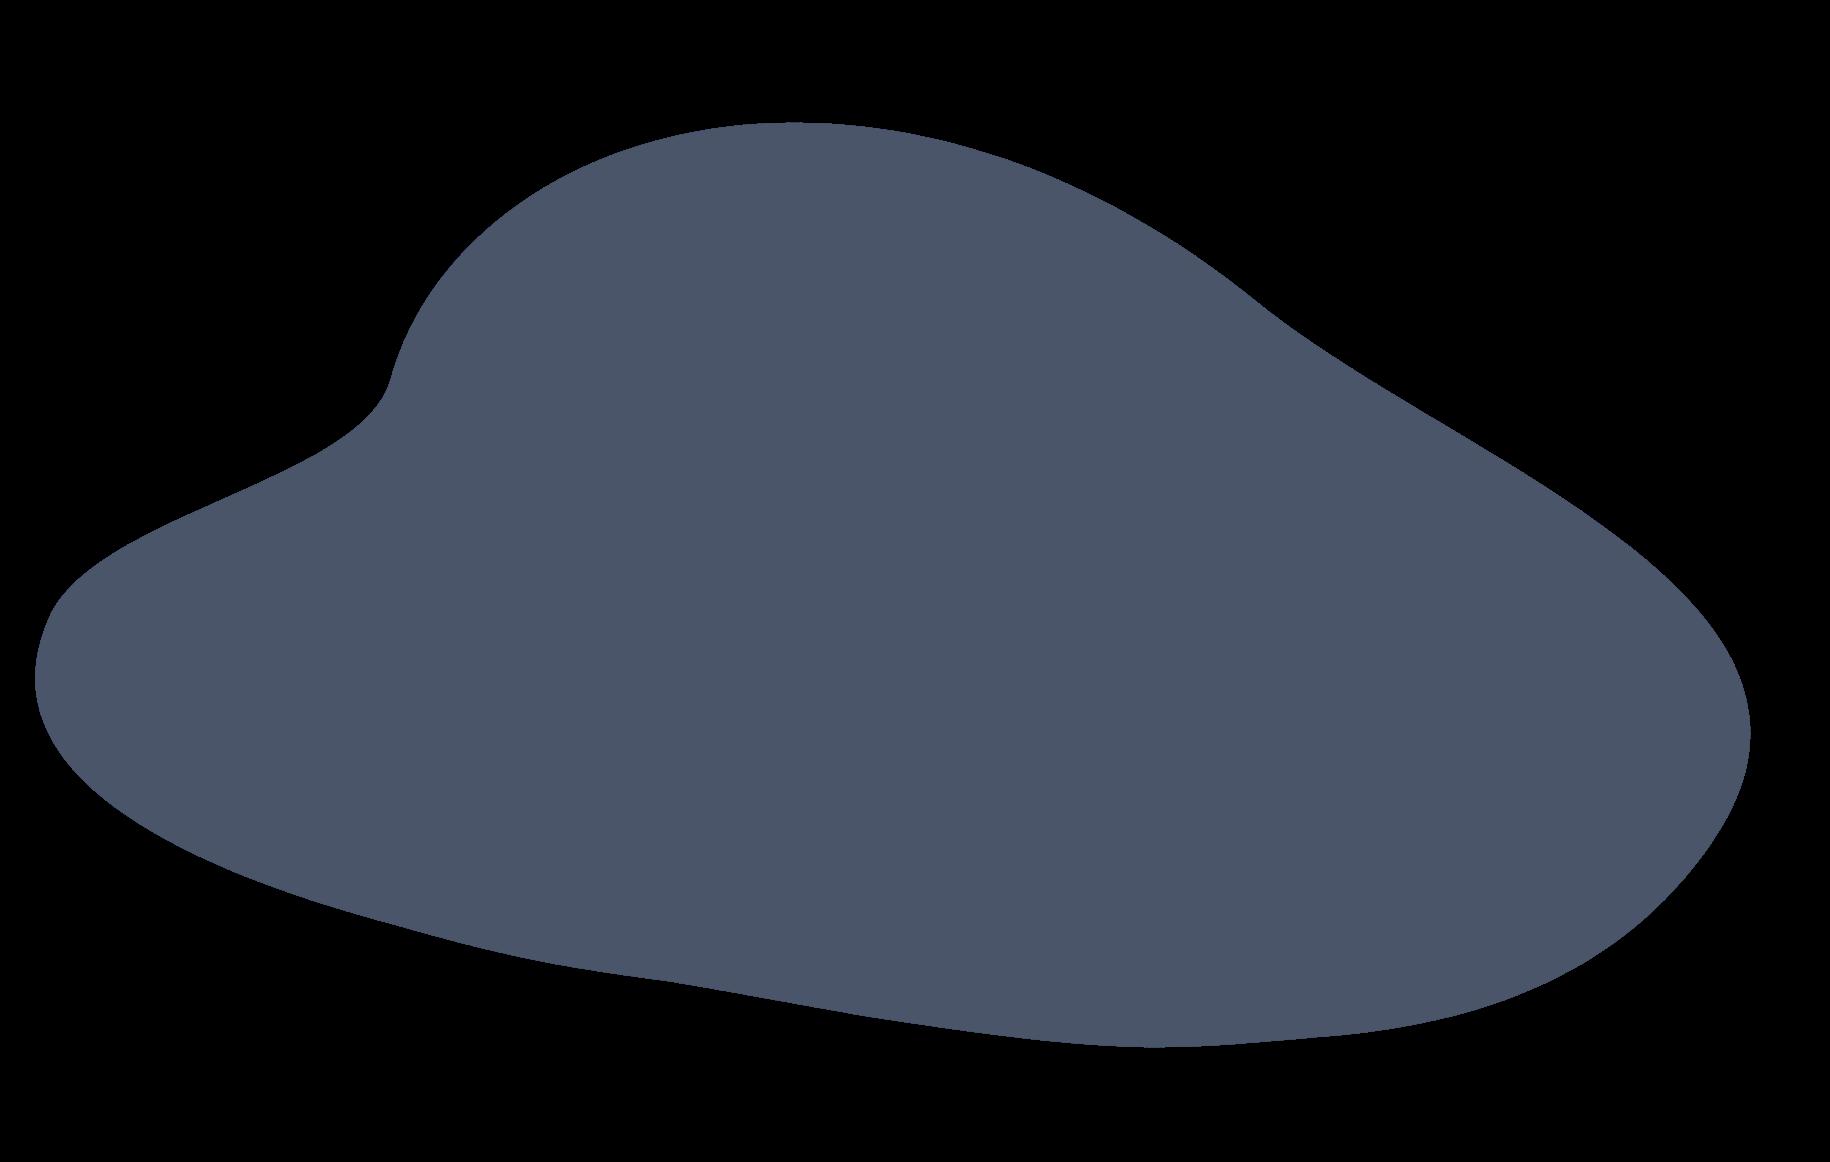 Blob@2x.png?width=1830&name=Blob@2x